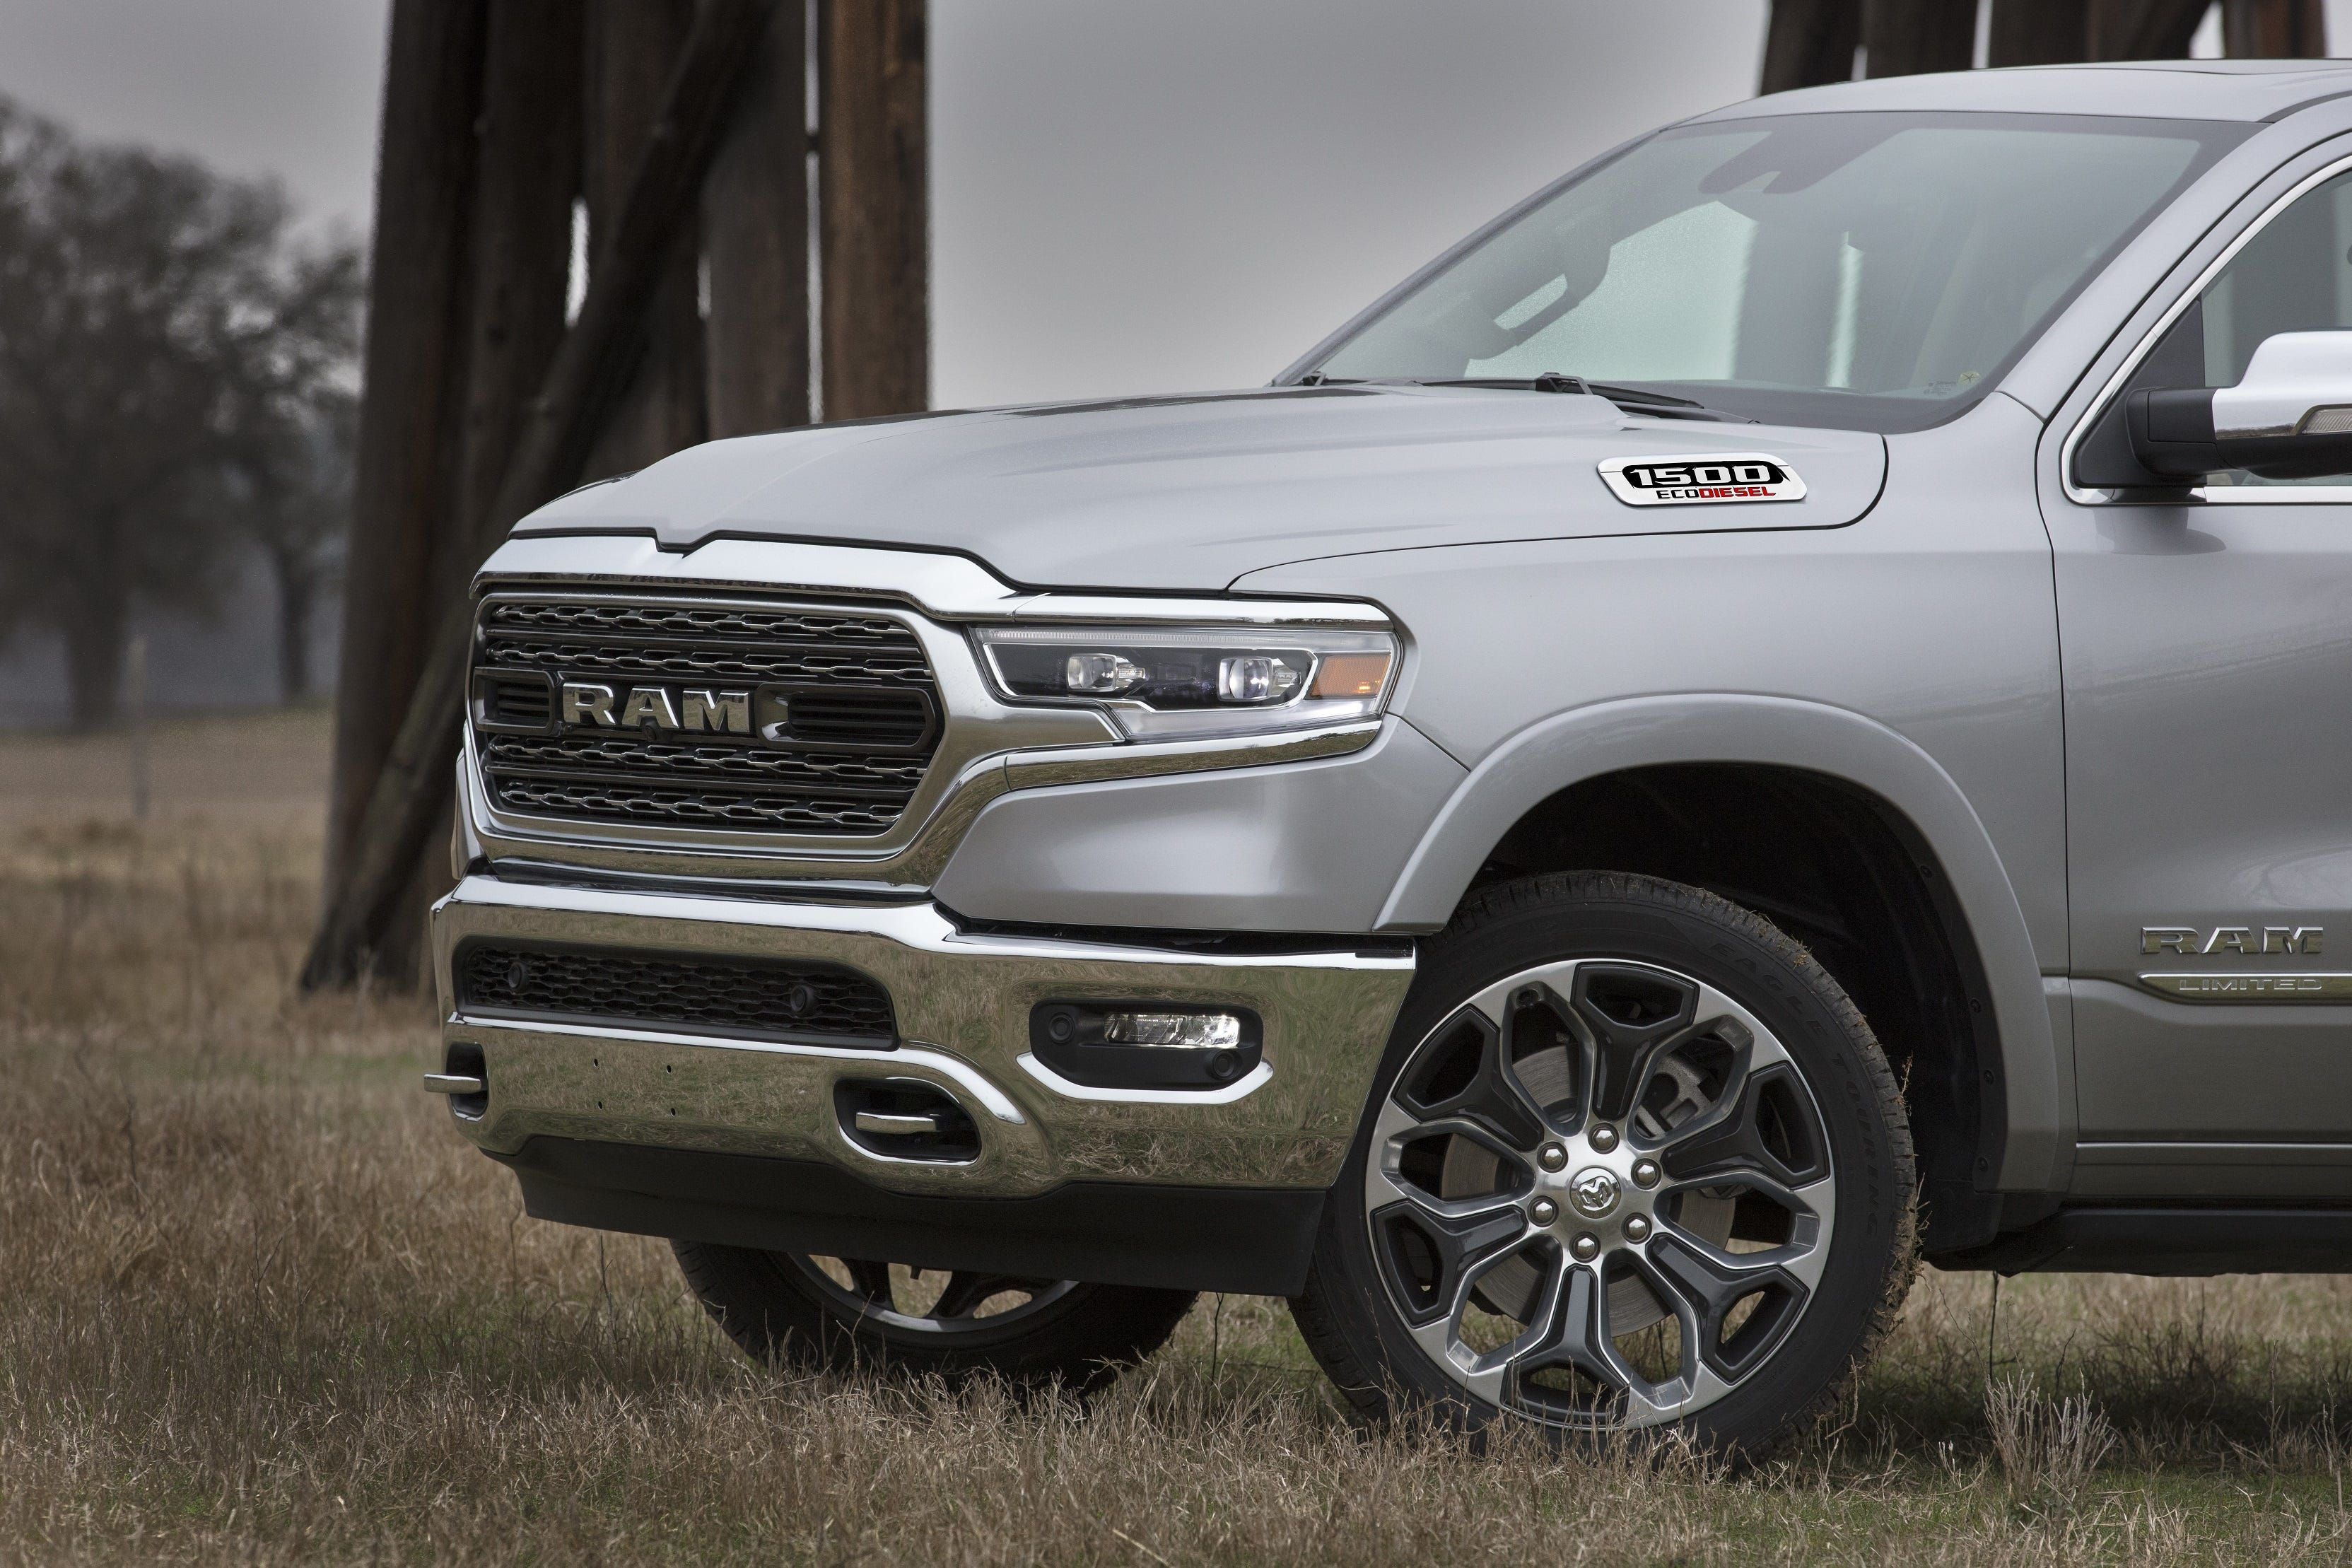 New 2020 Ram 1500 Will Offer Ecodiesel 2019 Ram 1500 Fuel Economy New Engine